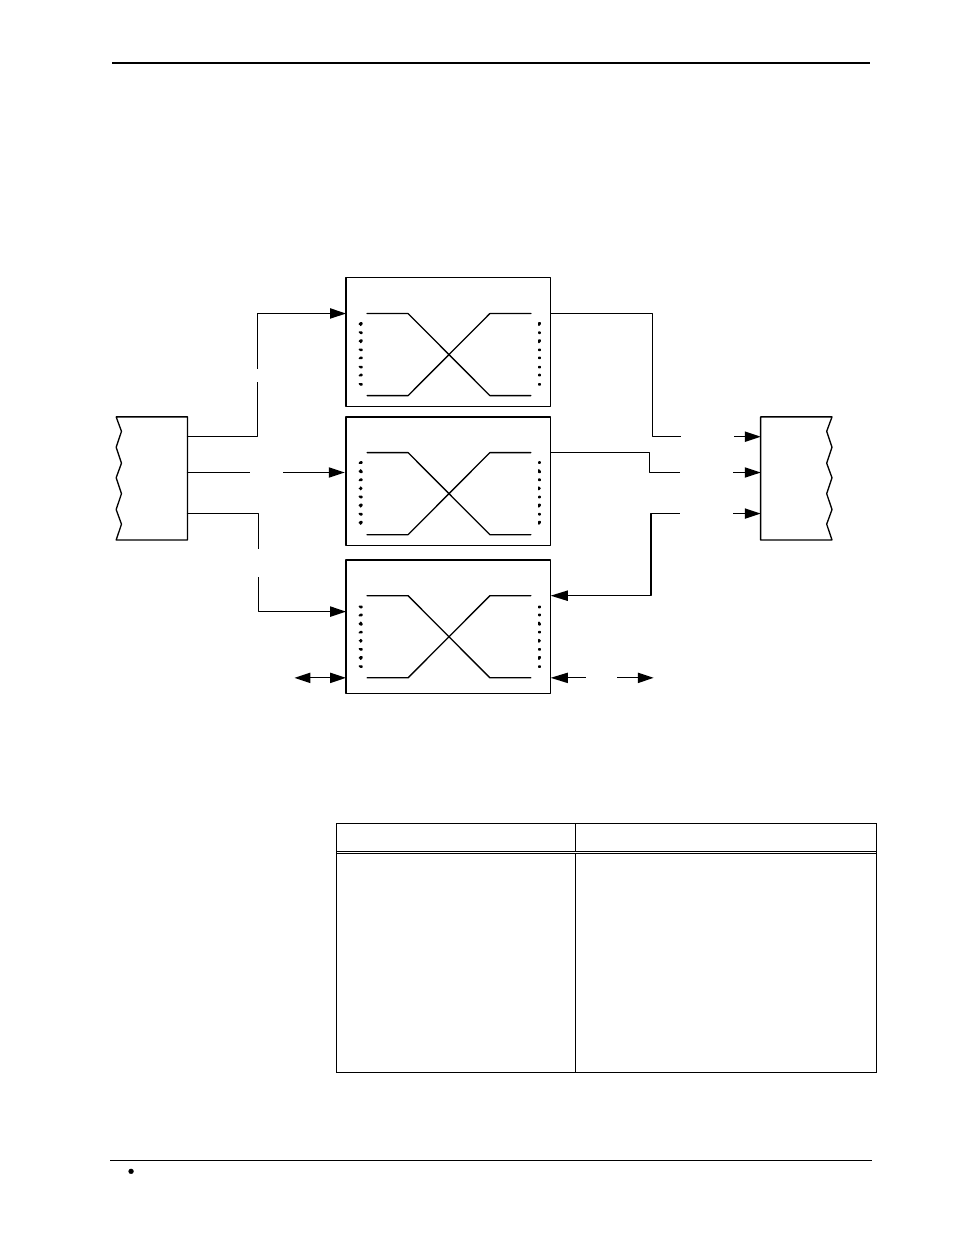 Internal Block Diagram Specifications 8x8 Digitalmedia Switcher Enet Wire Crestron Dm Md8x8 Electronic User Manual Page 10 112